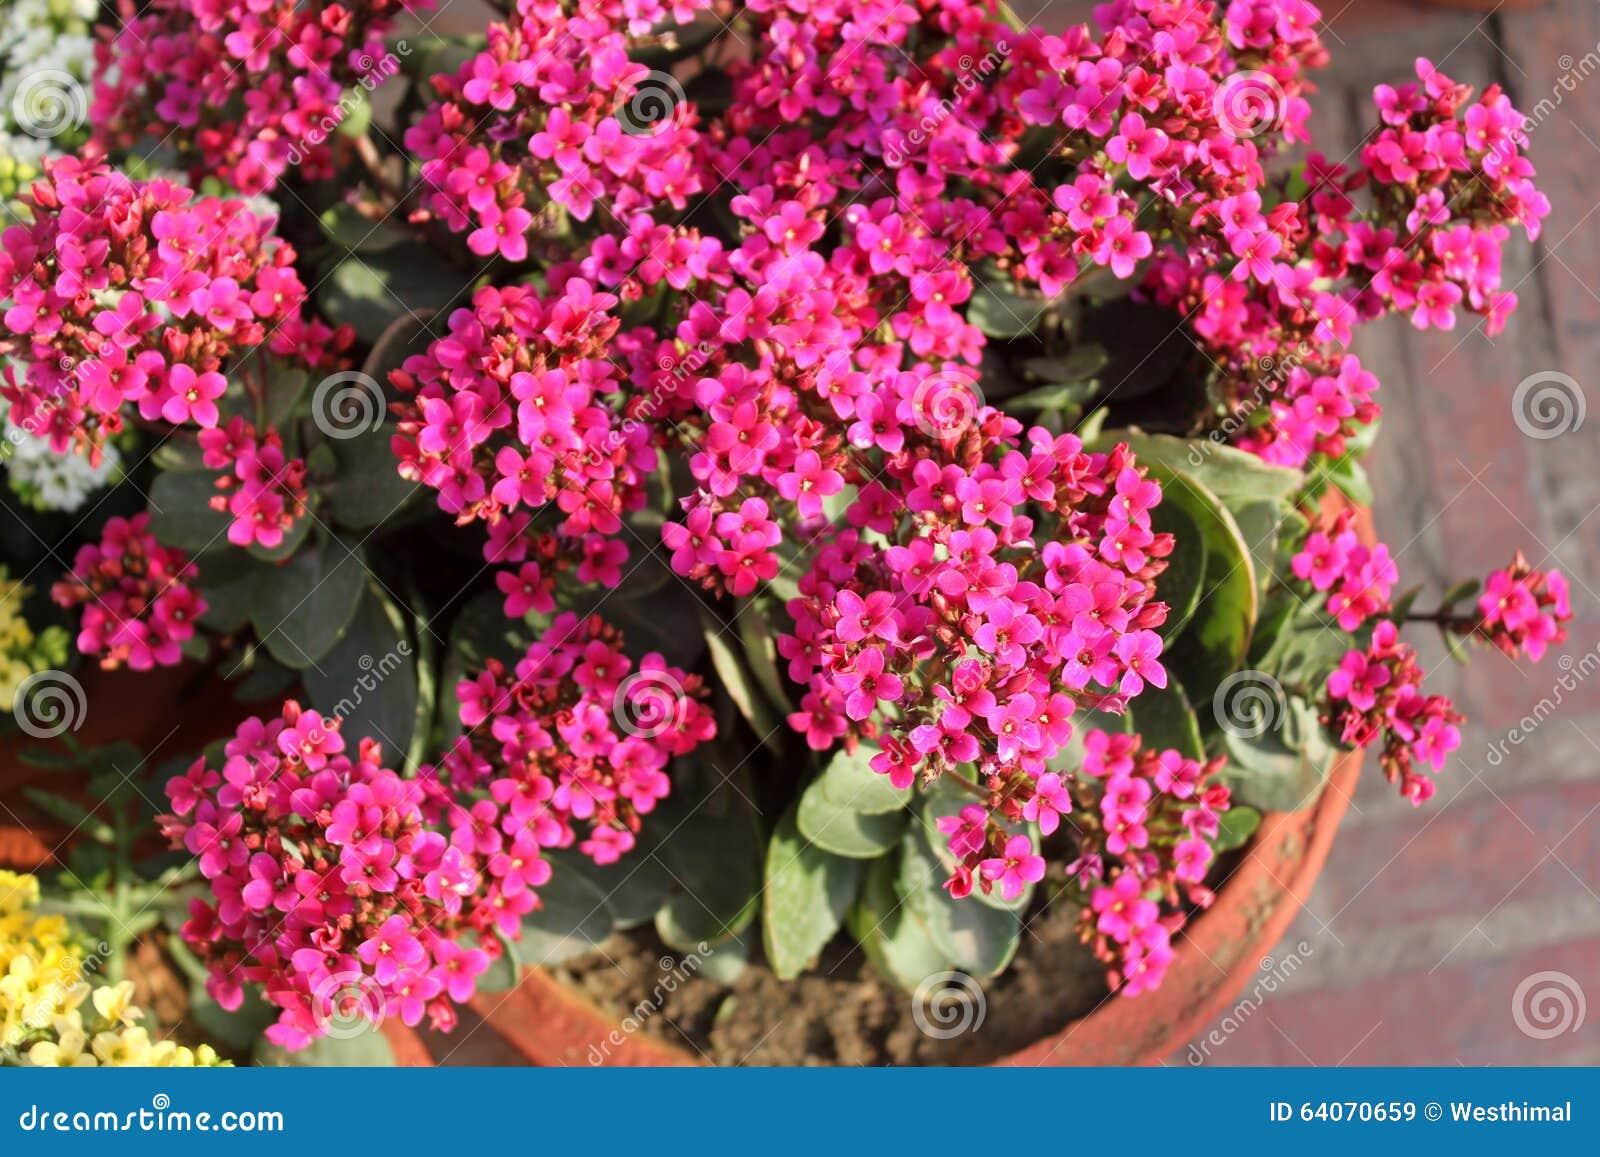 Kalanchoe blossfeldiana pink stock image image of small pink kalanchoe blossfeldiana pink stock image image of small pink 64070659 mightylinksfo